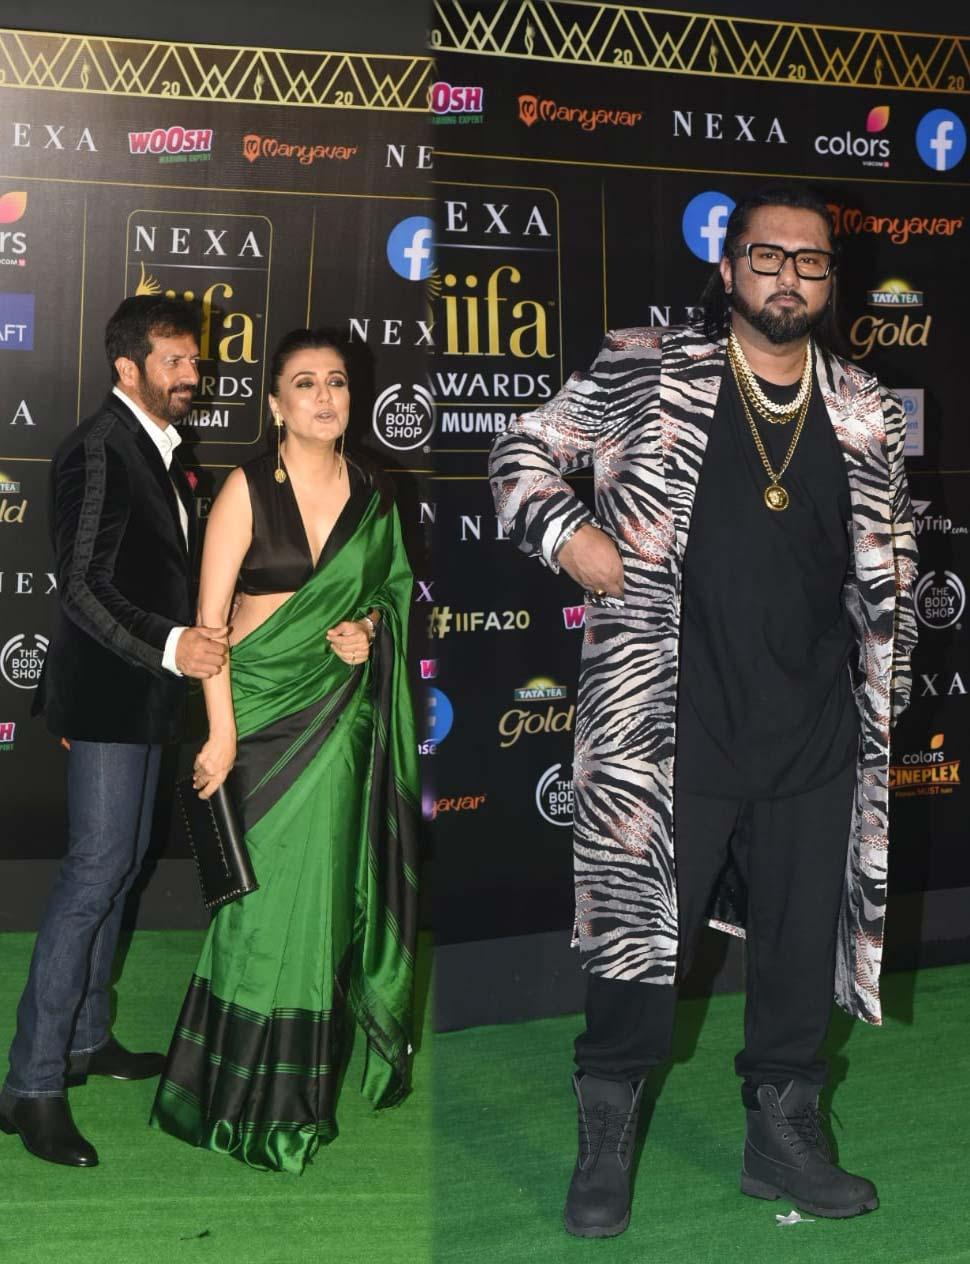 IIFA Awards 2019: Deepika Padukone shahid Kapoor katrina kaif and others at Red Carpet